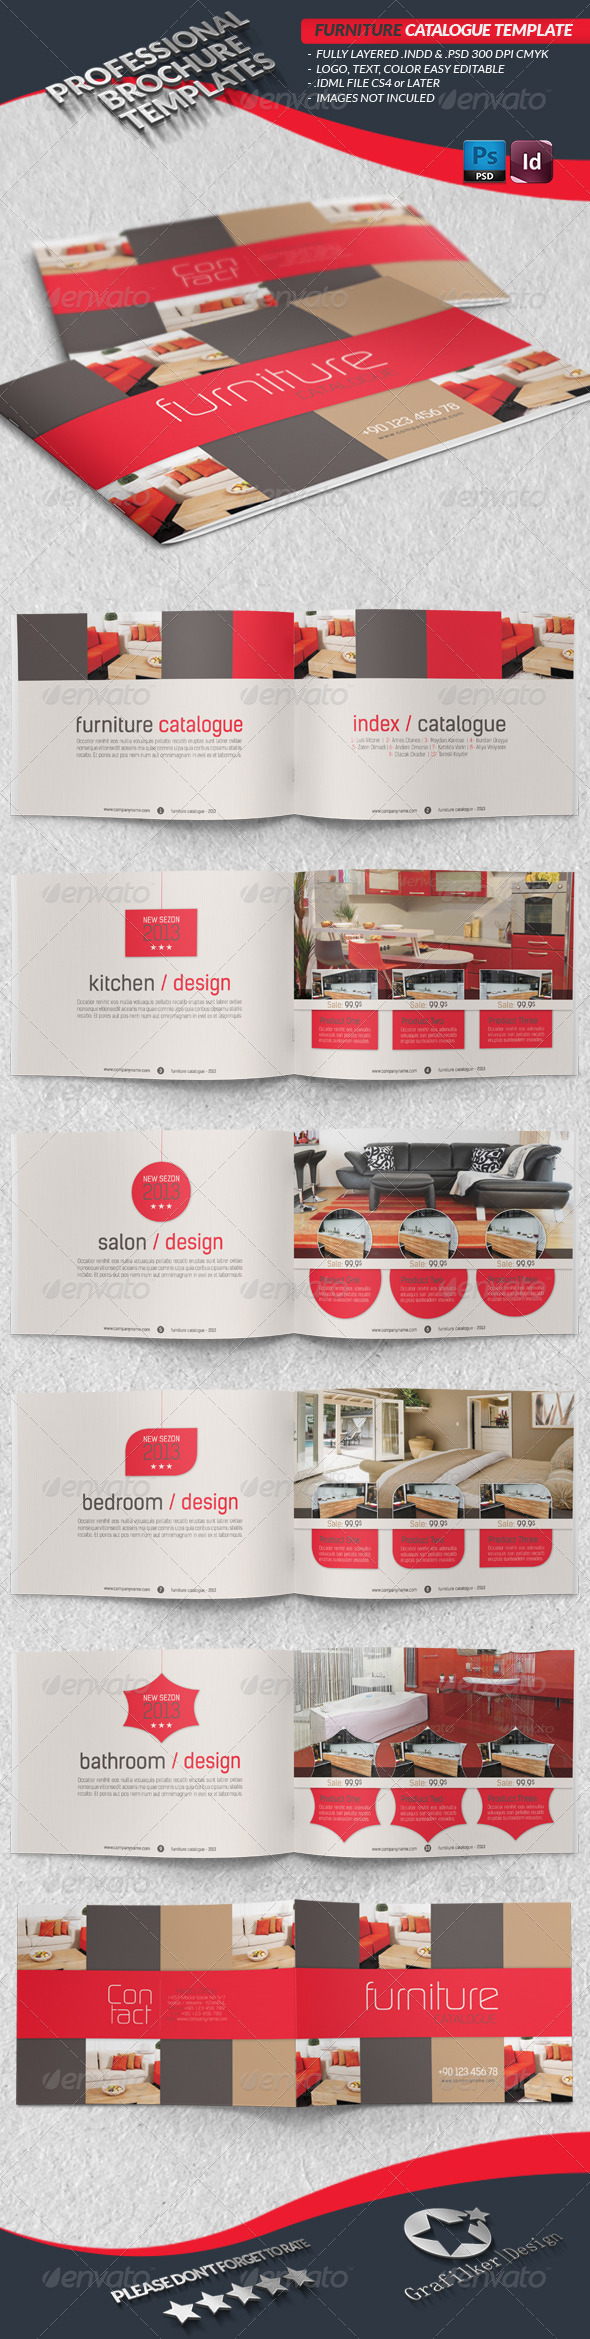 GraphicRiver Furniture Catalogue Template 4396096